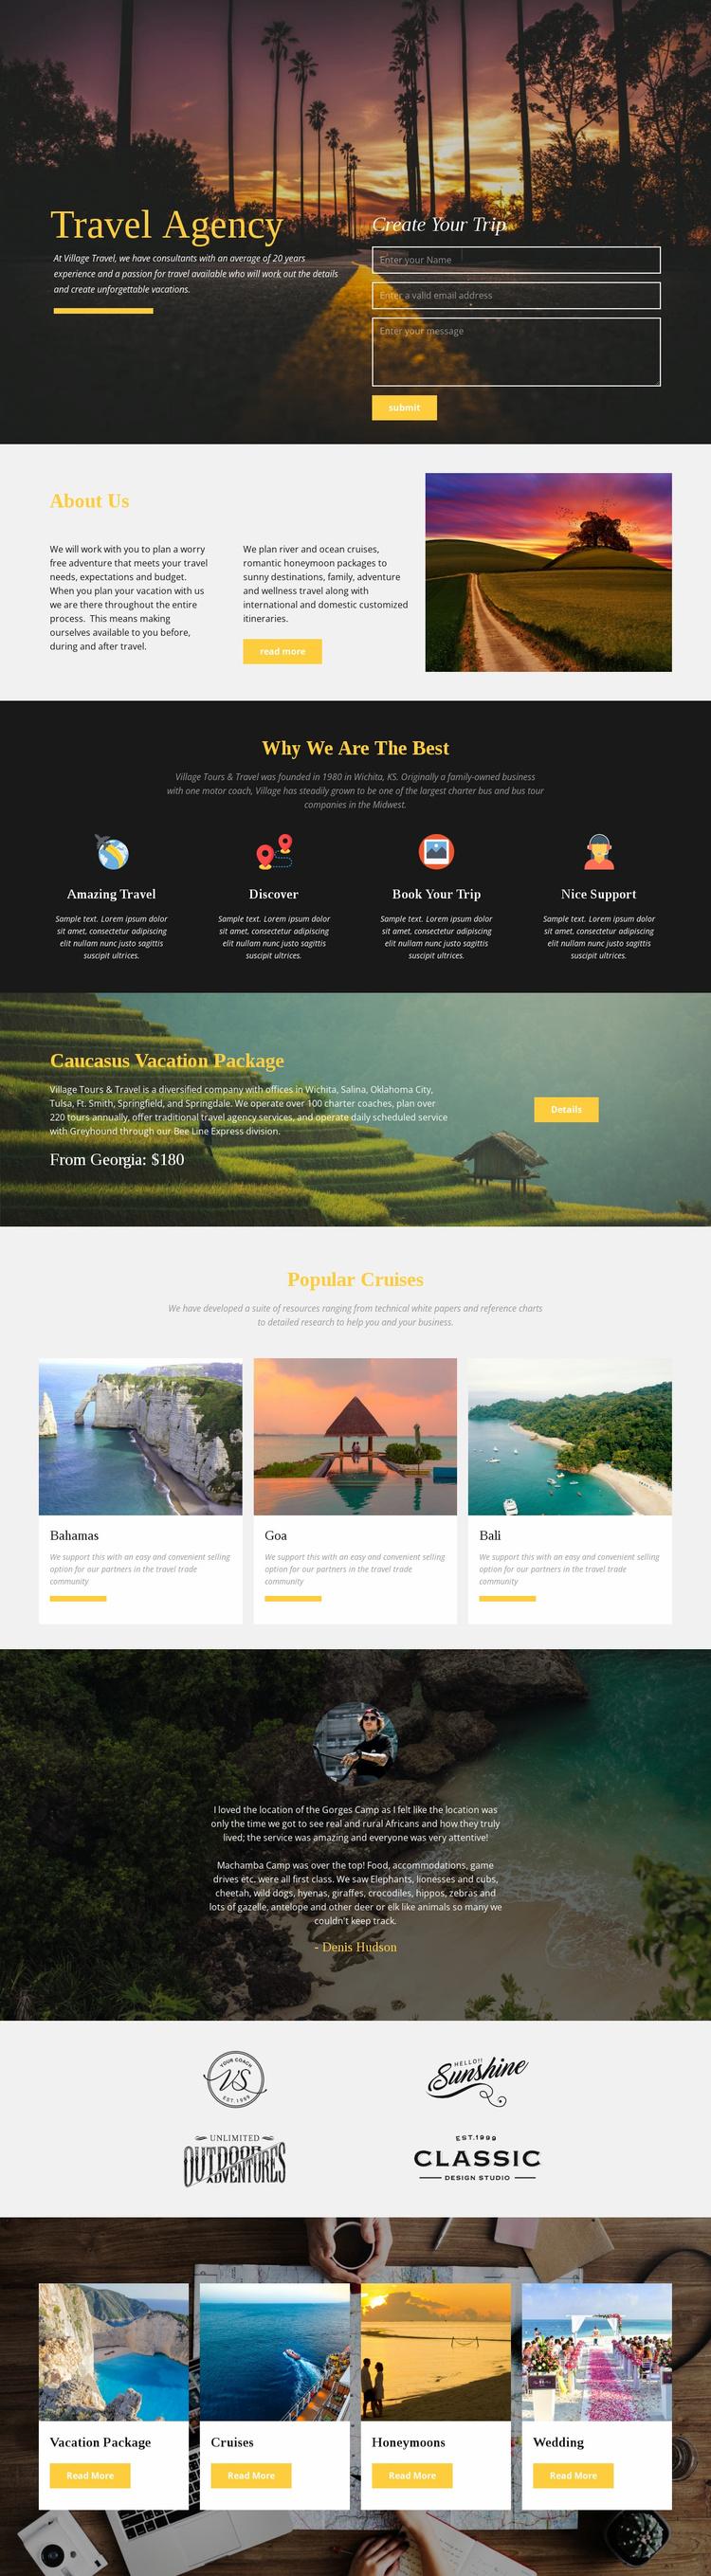 African safari tour company Website Template